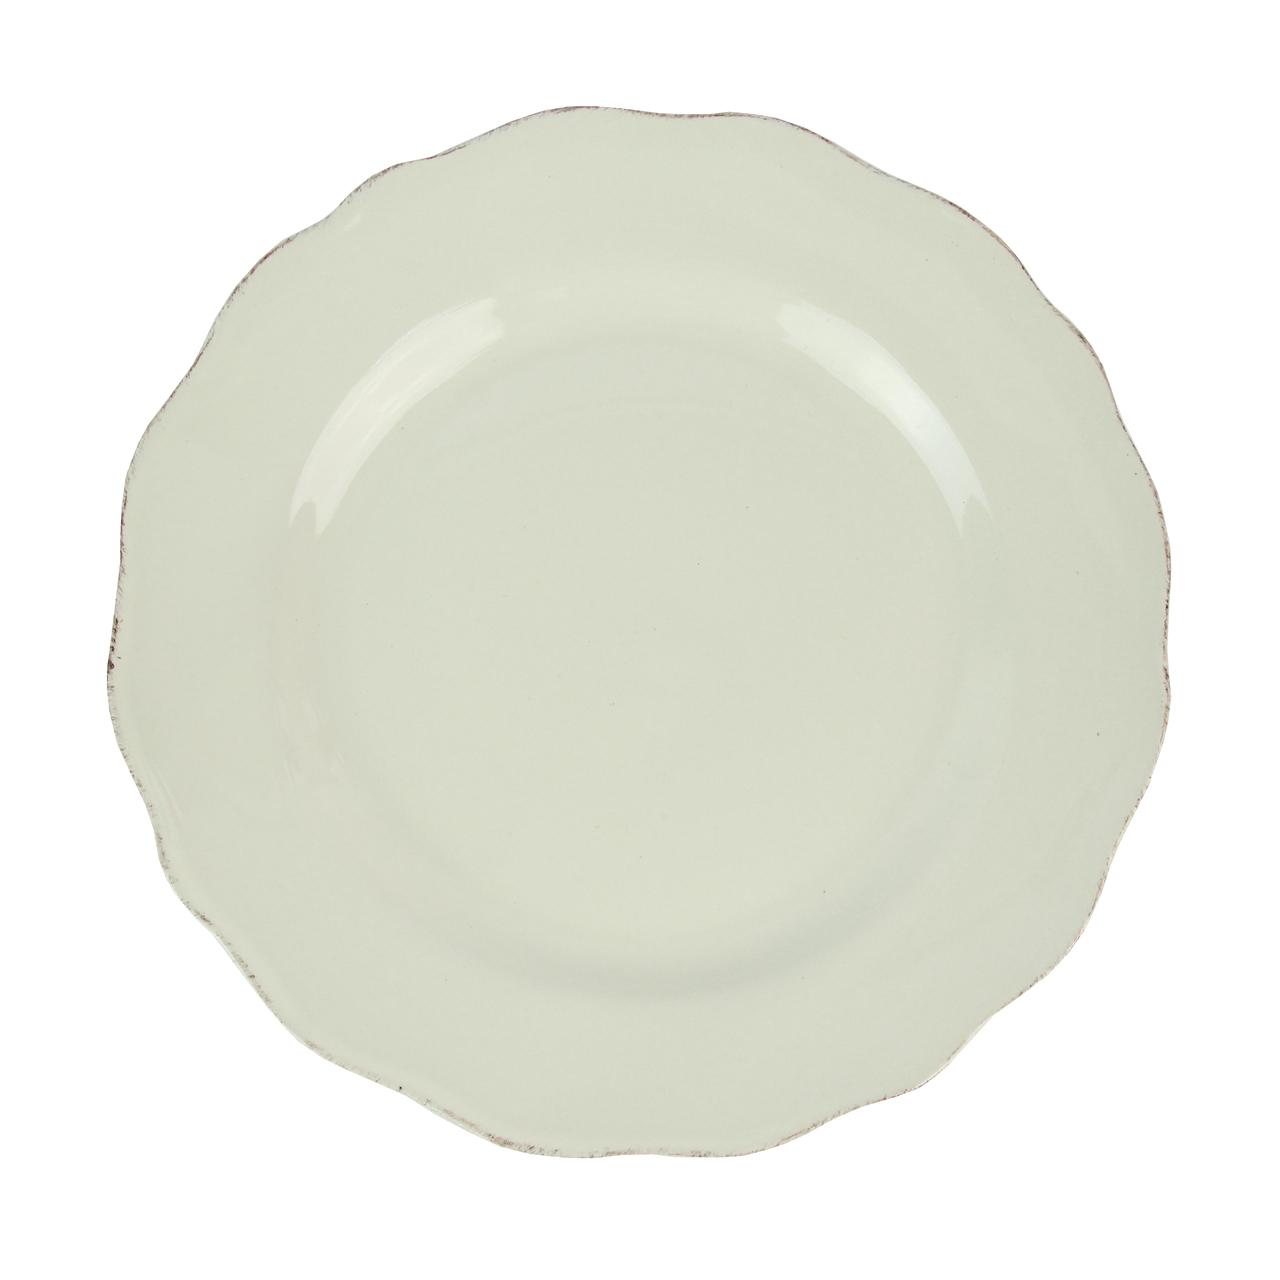 Farfurie Plata Din Ceramica Bej 27 Cm